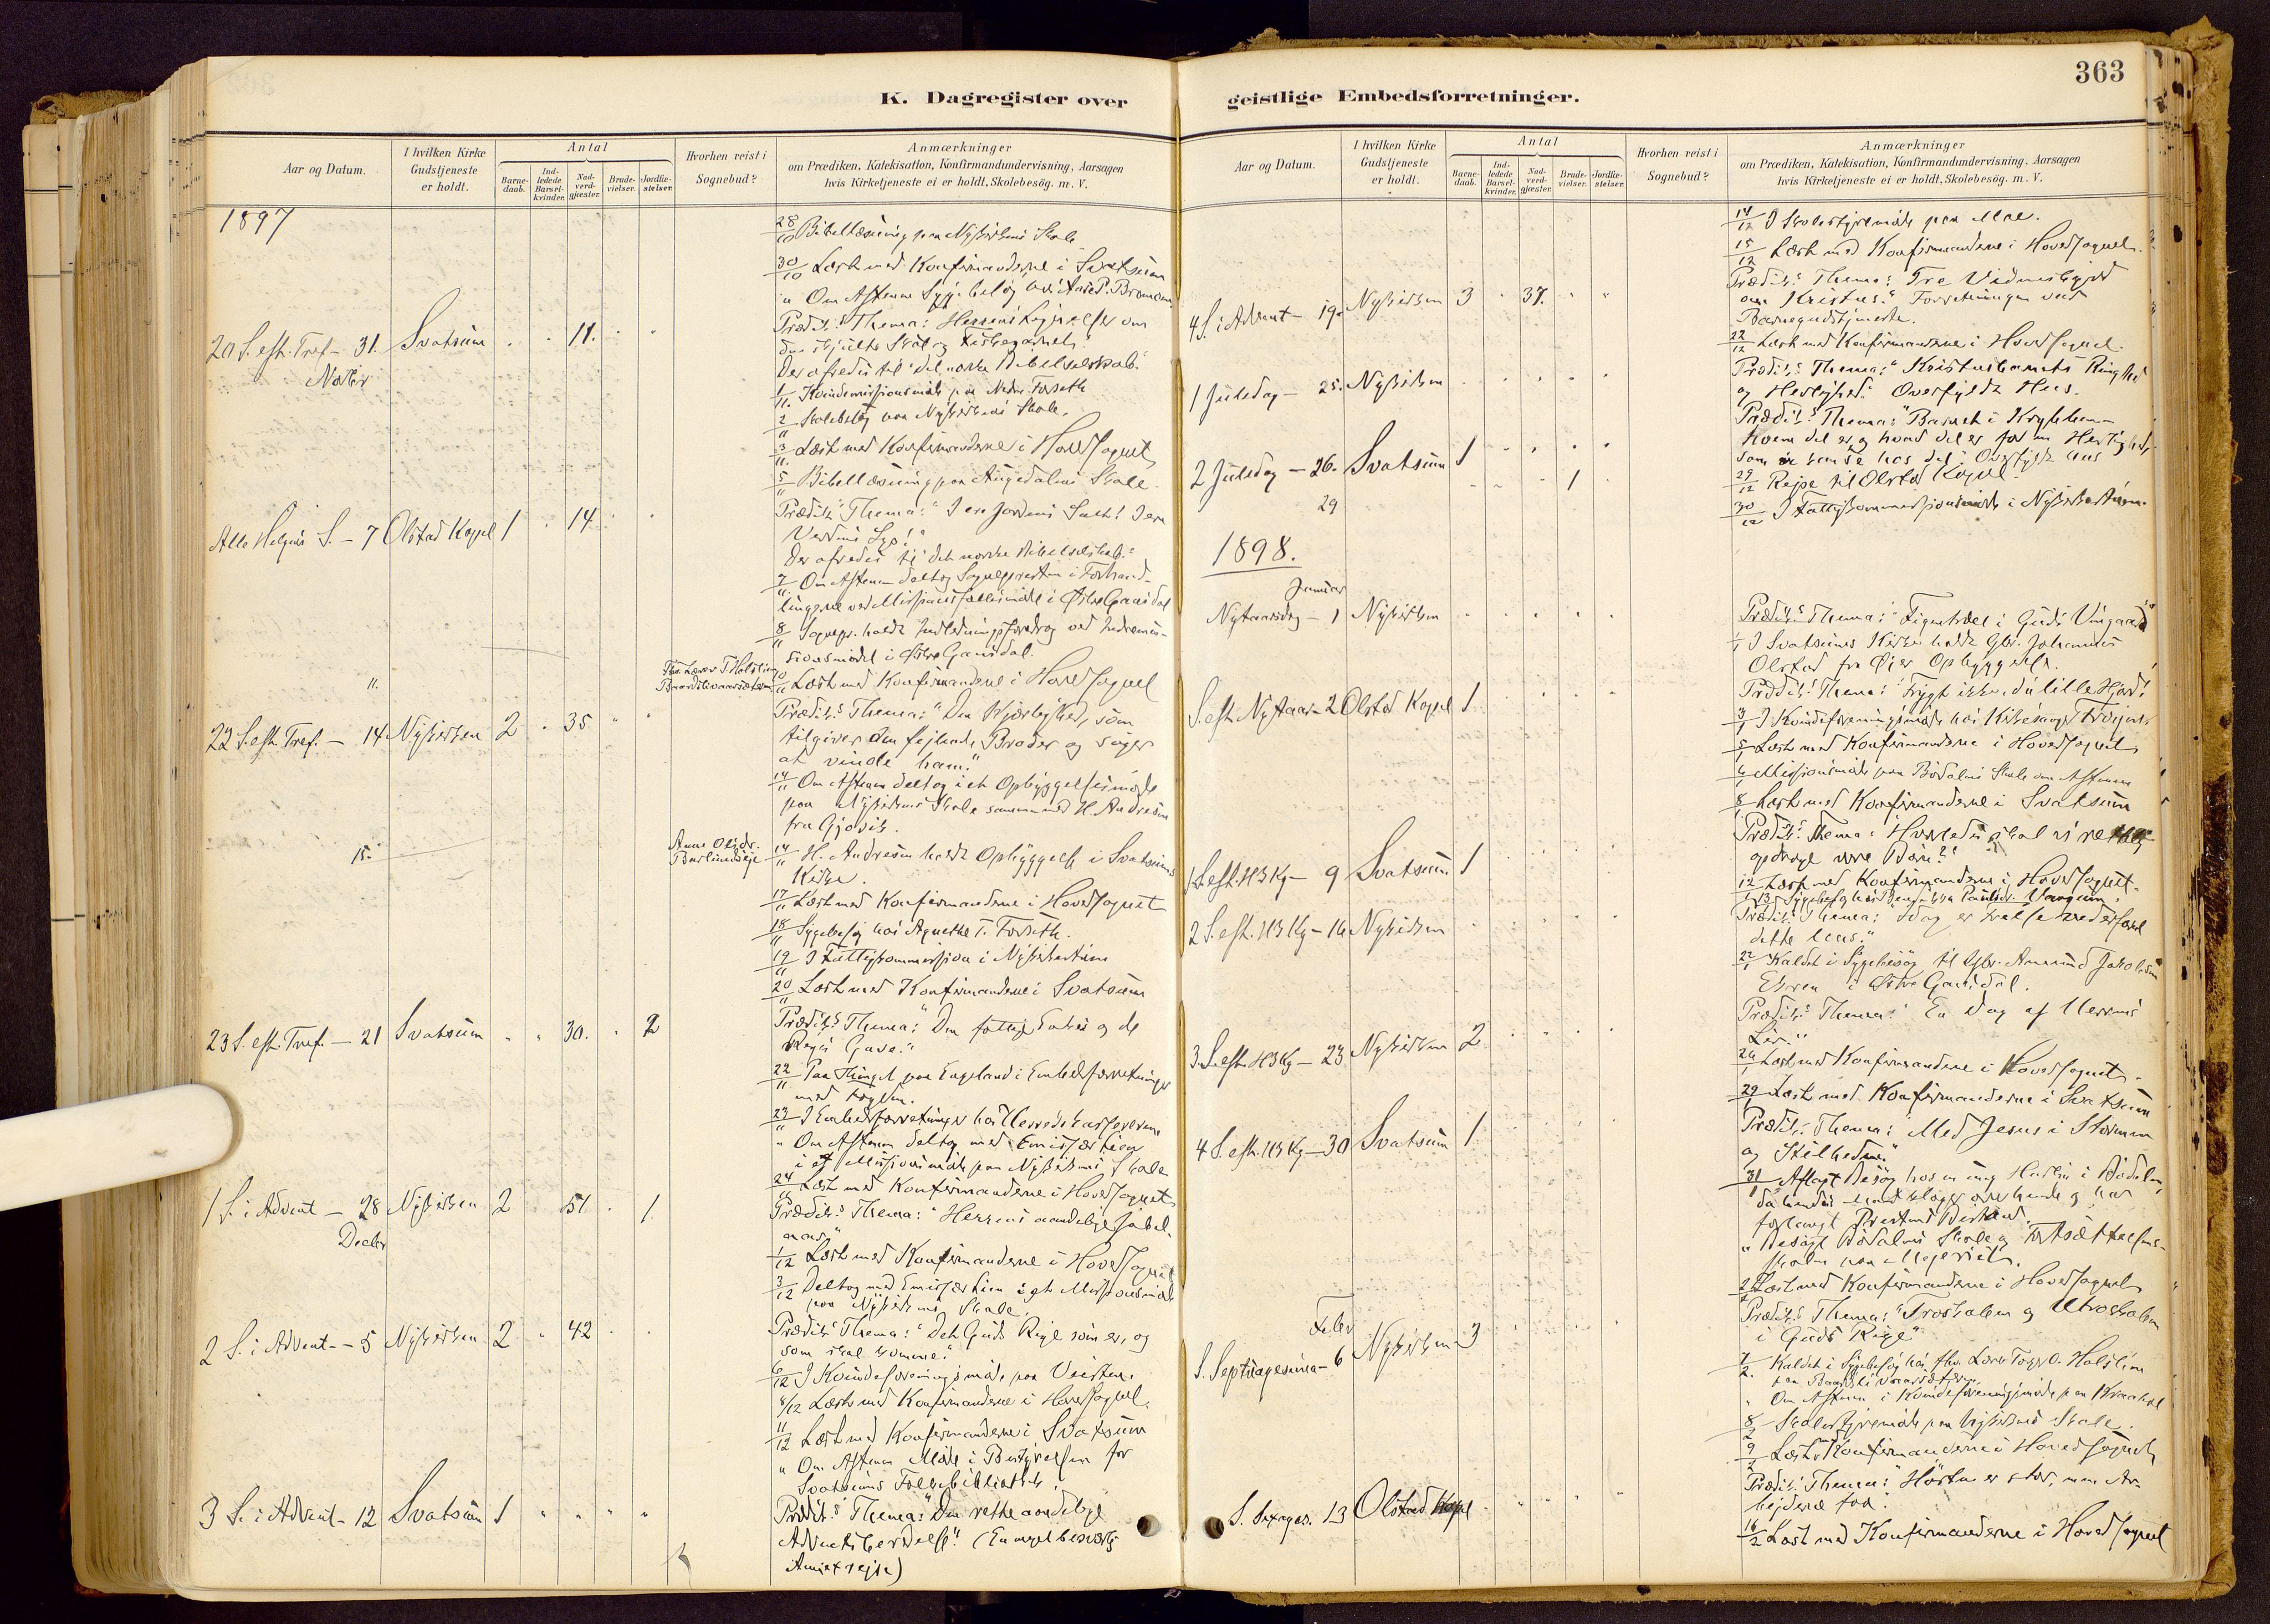 SAH, Vestre Gausdal prestekontor, Ministerialbok nr. 1, 1887-1914, s. 363